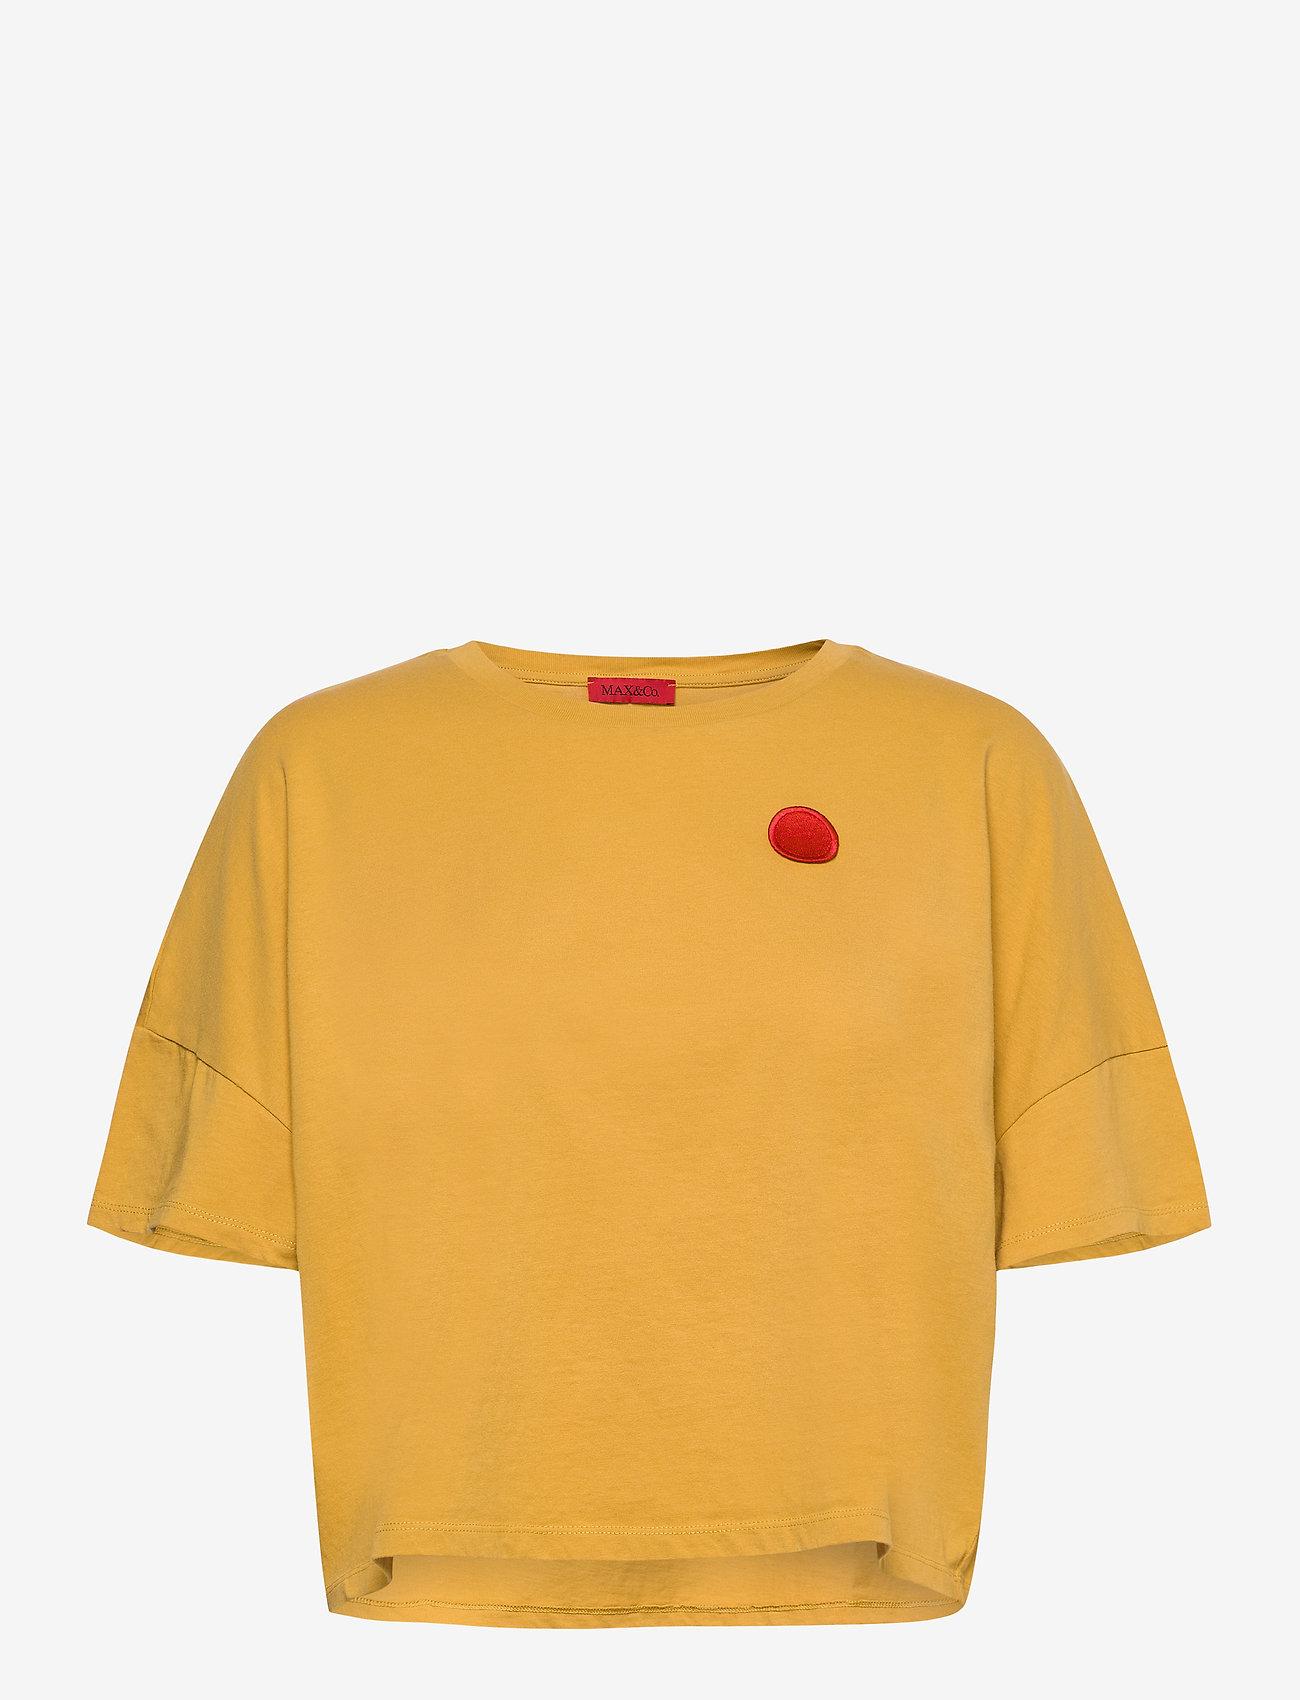 Max&Co. - DAVVERO - navel shirts - pale yellow - 0